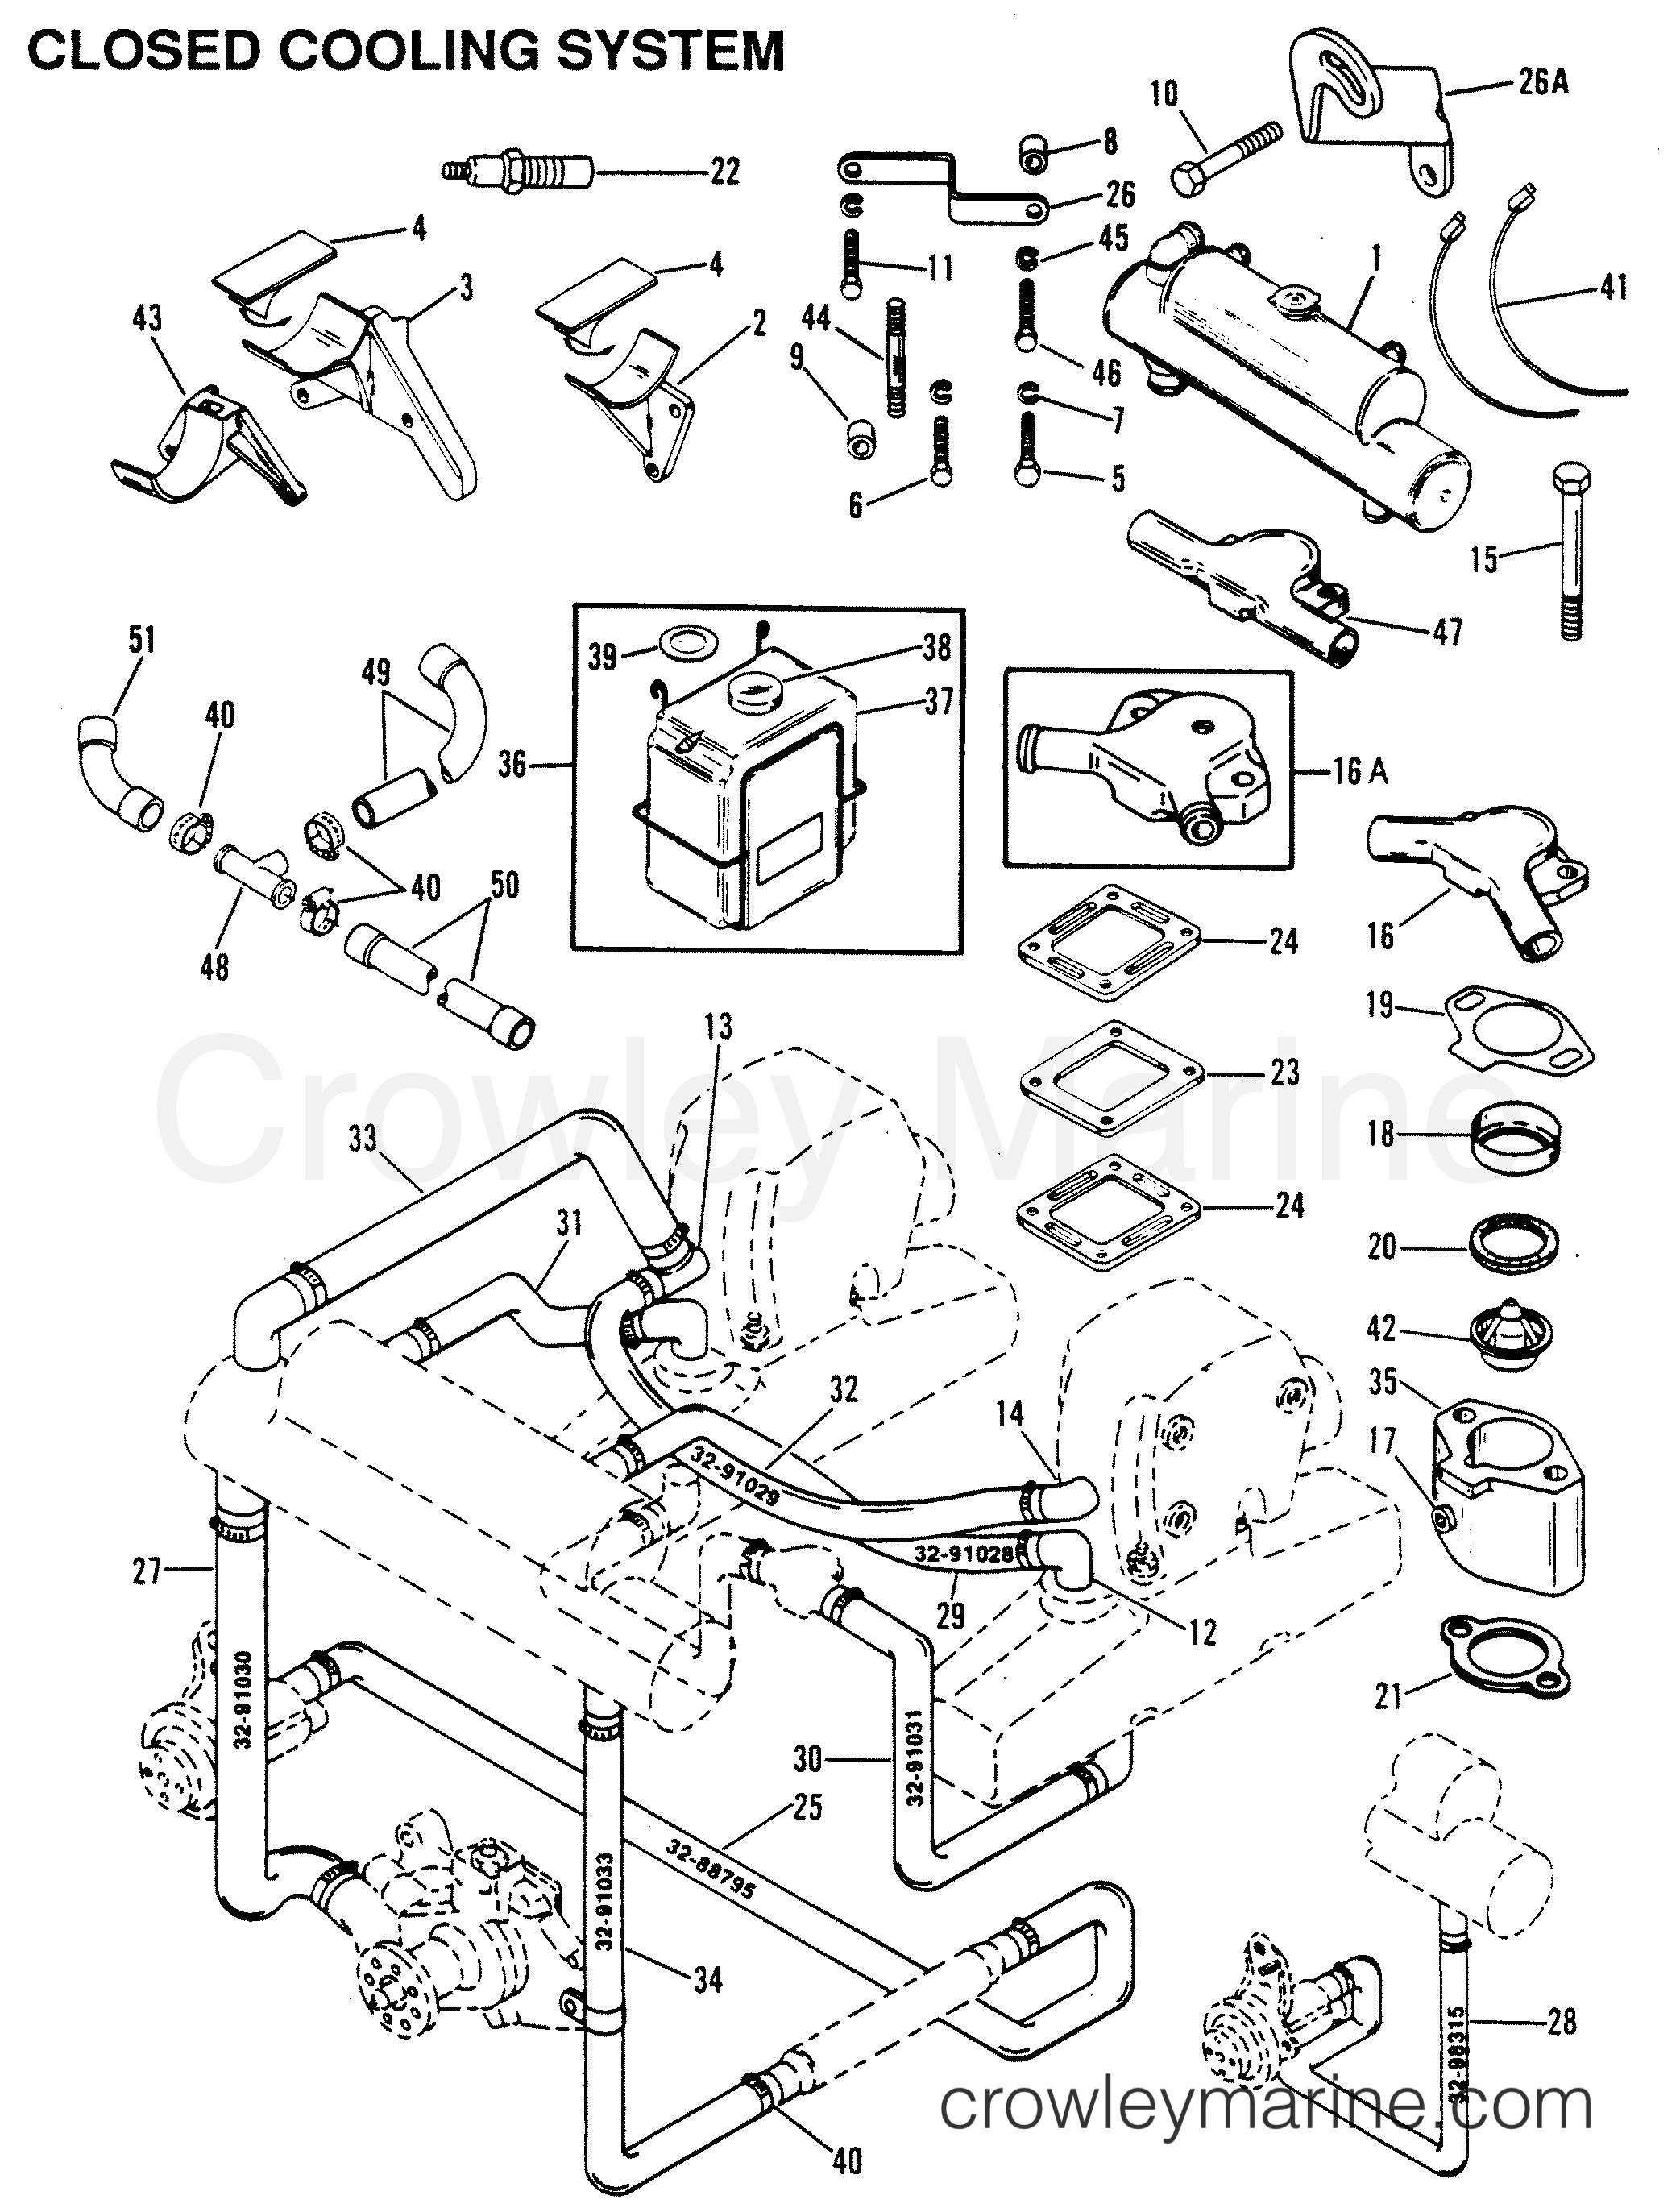 Closed Cooling System  91036a1  A3  A5  A8   Tiller